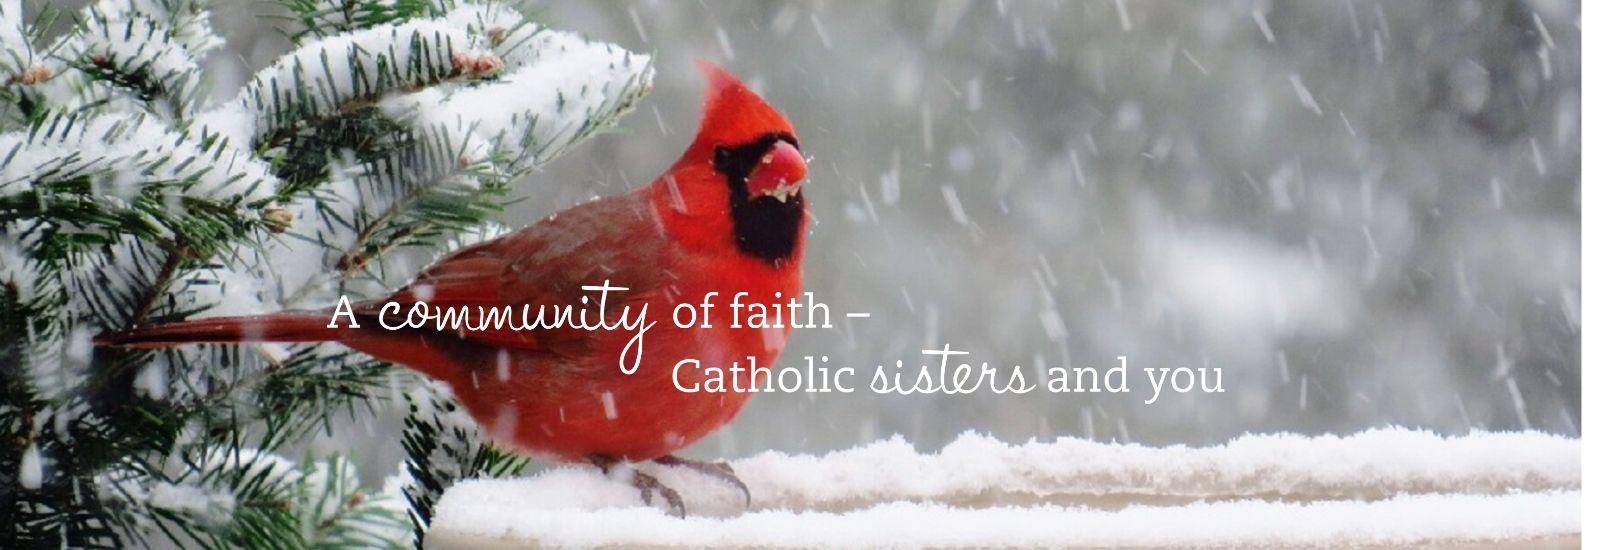 A Nun's Life Ministry